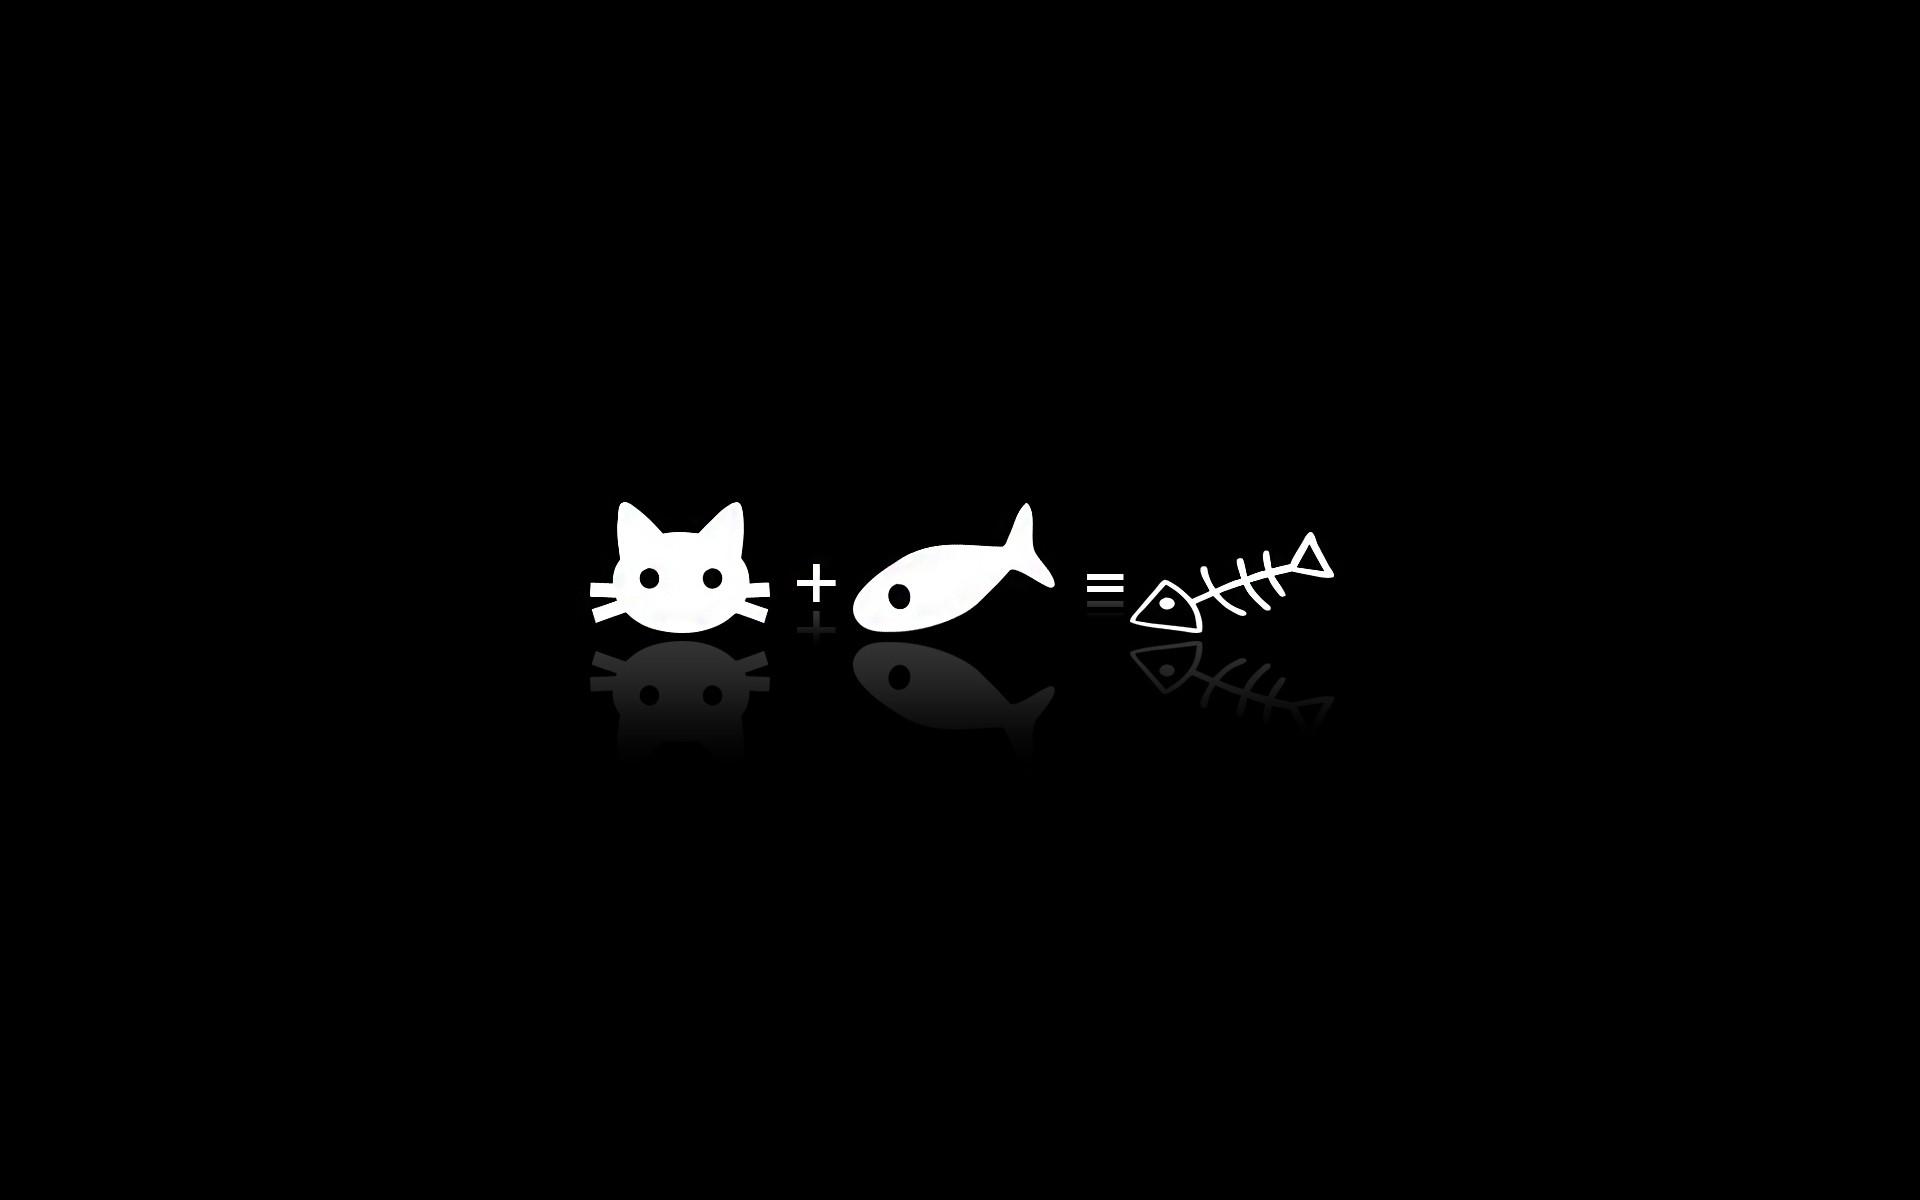 black humor cats minimalism